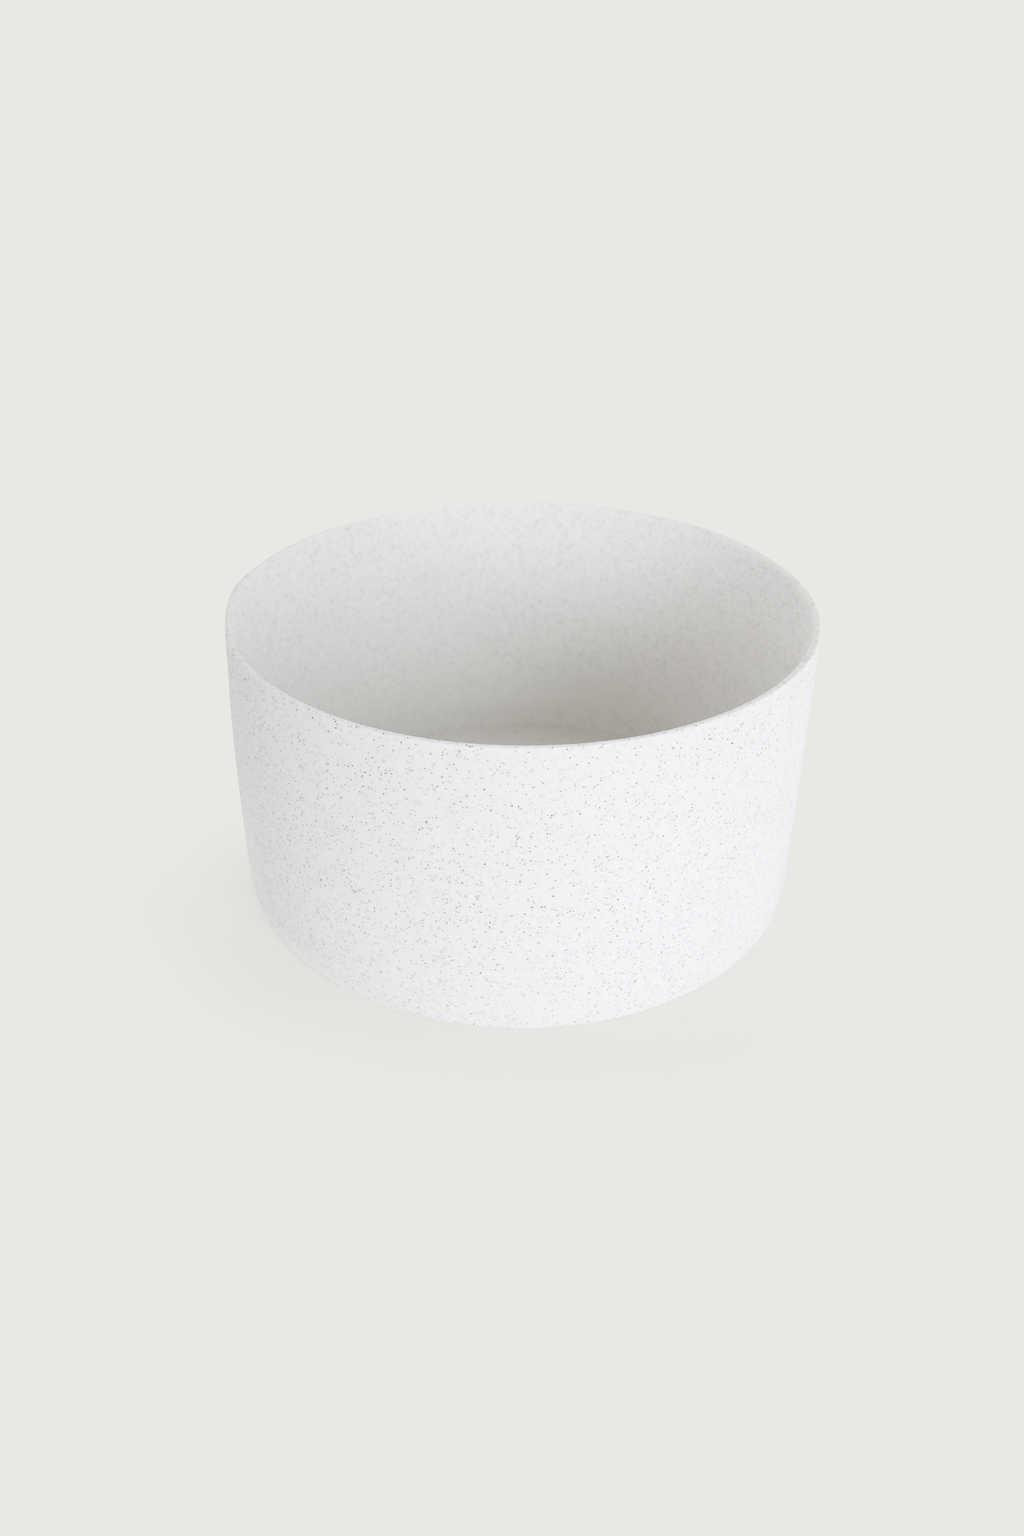 Wide Ceramic Planter 2947 White Speckeled 6